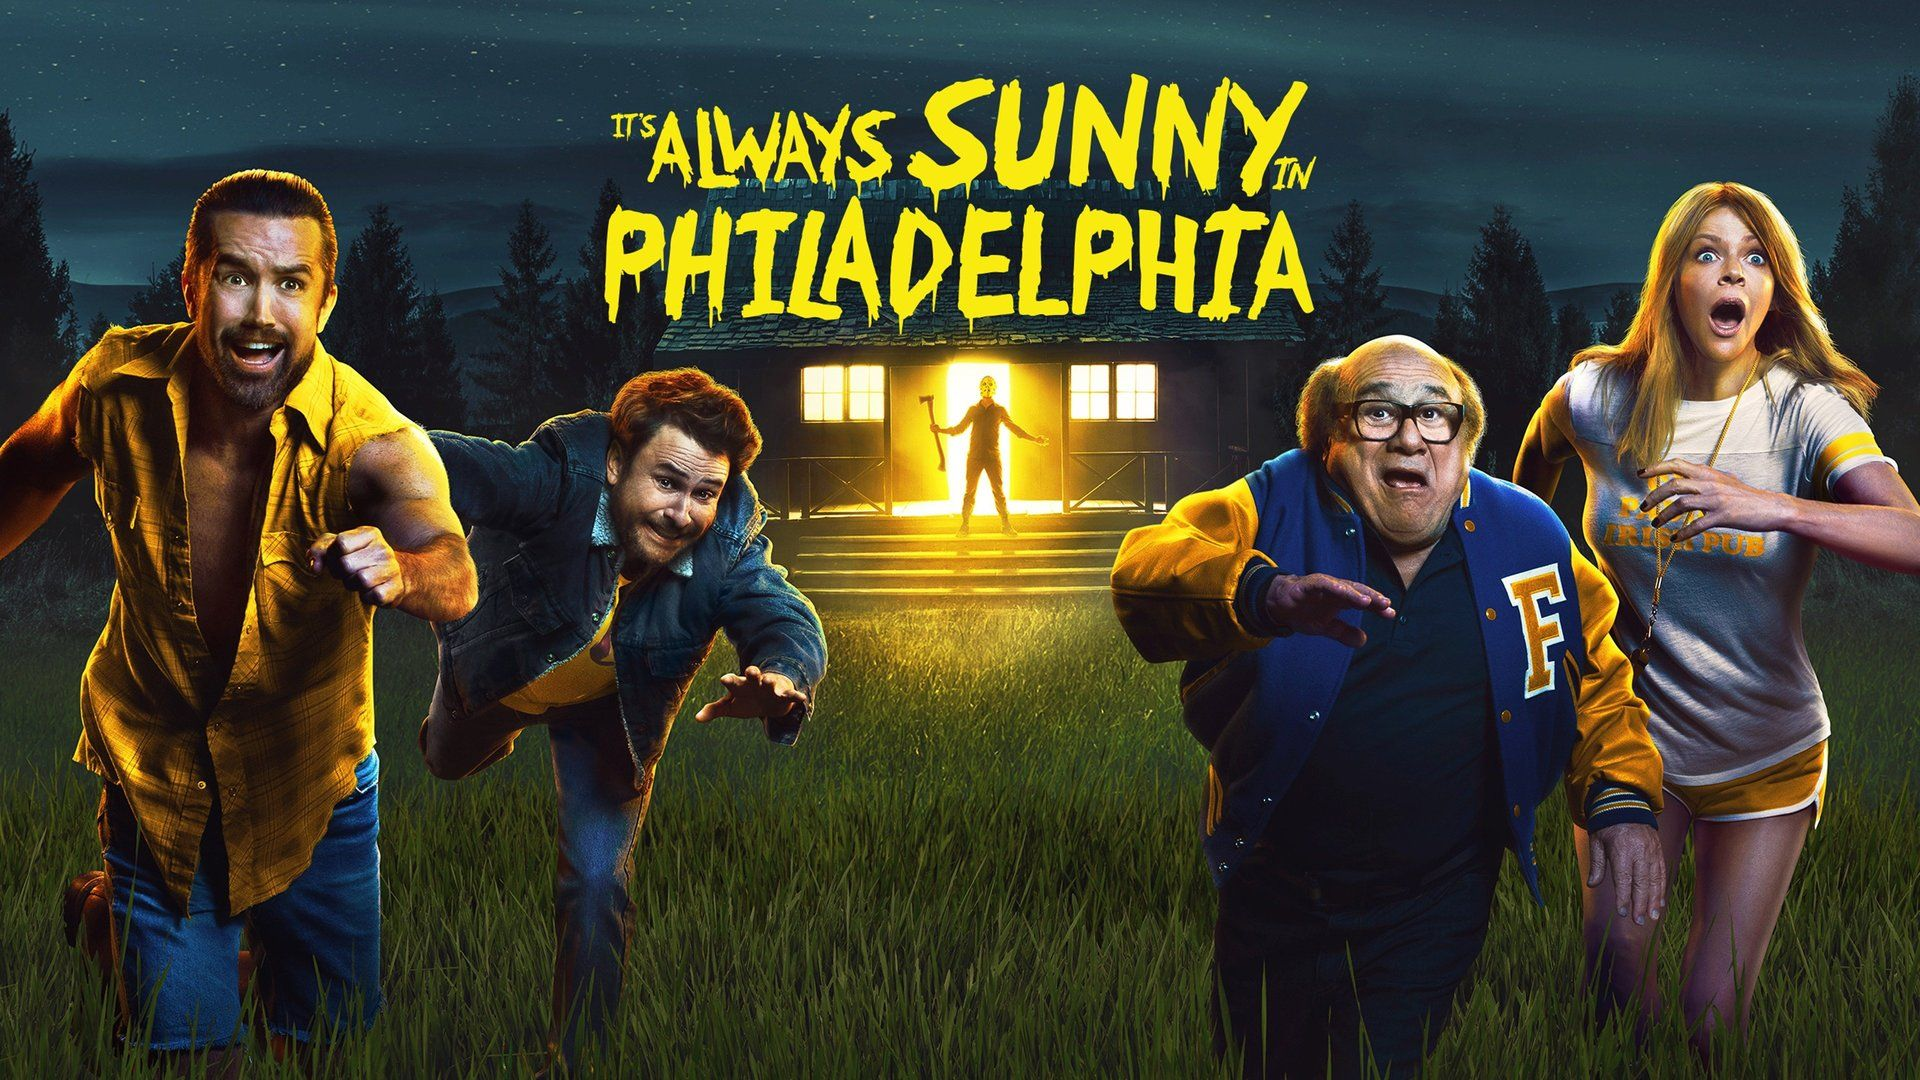 It S Always Sunny In Philadelphia Wallpapers Top Free It S